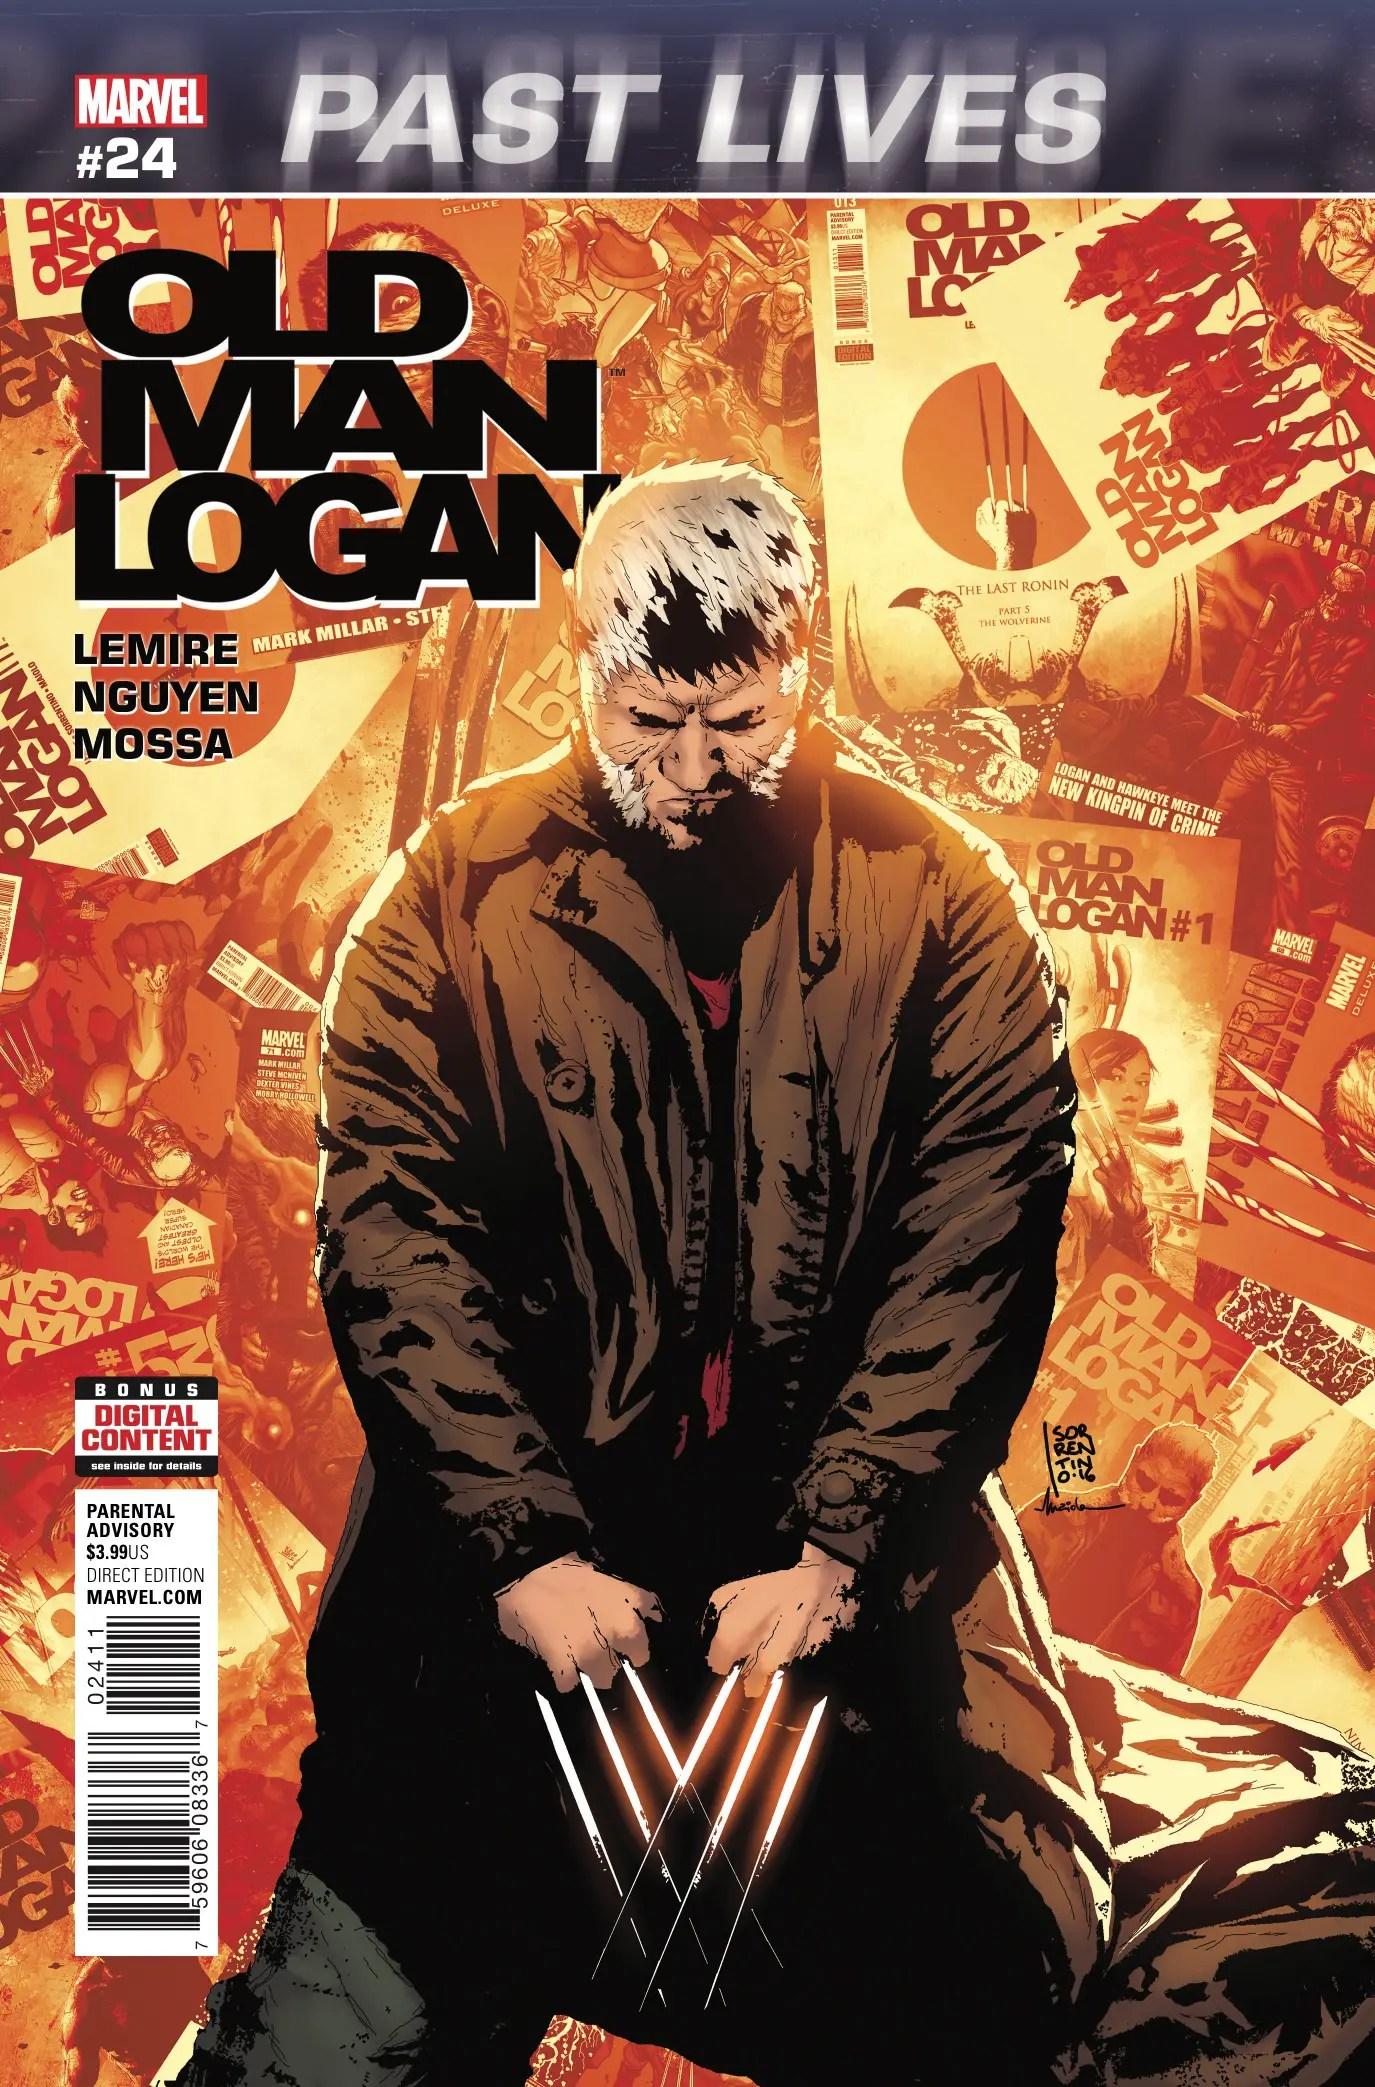 Old Man Logan #24 Review